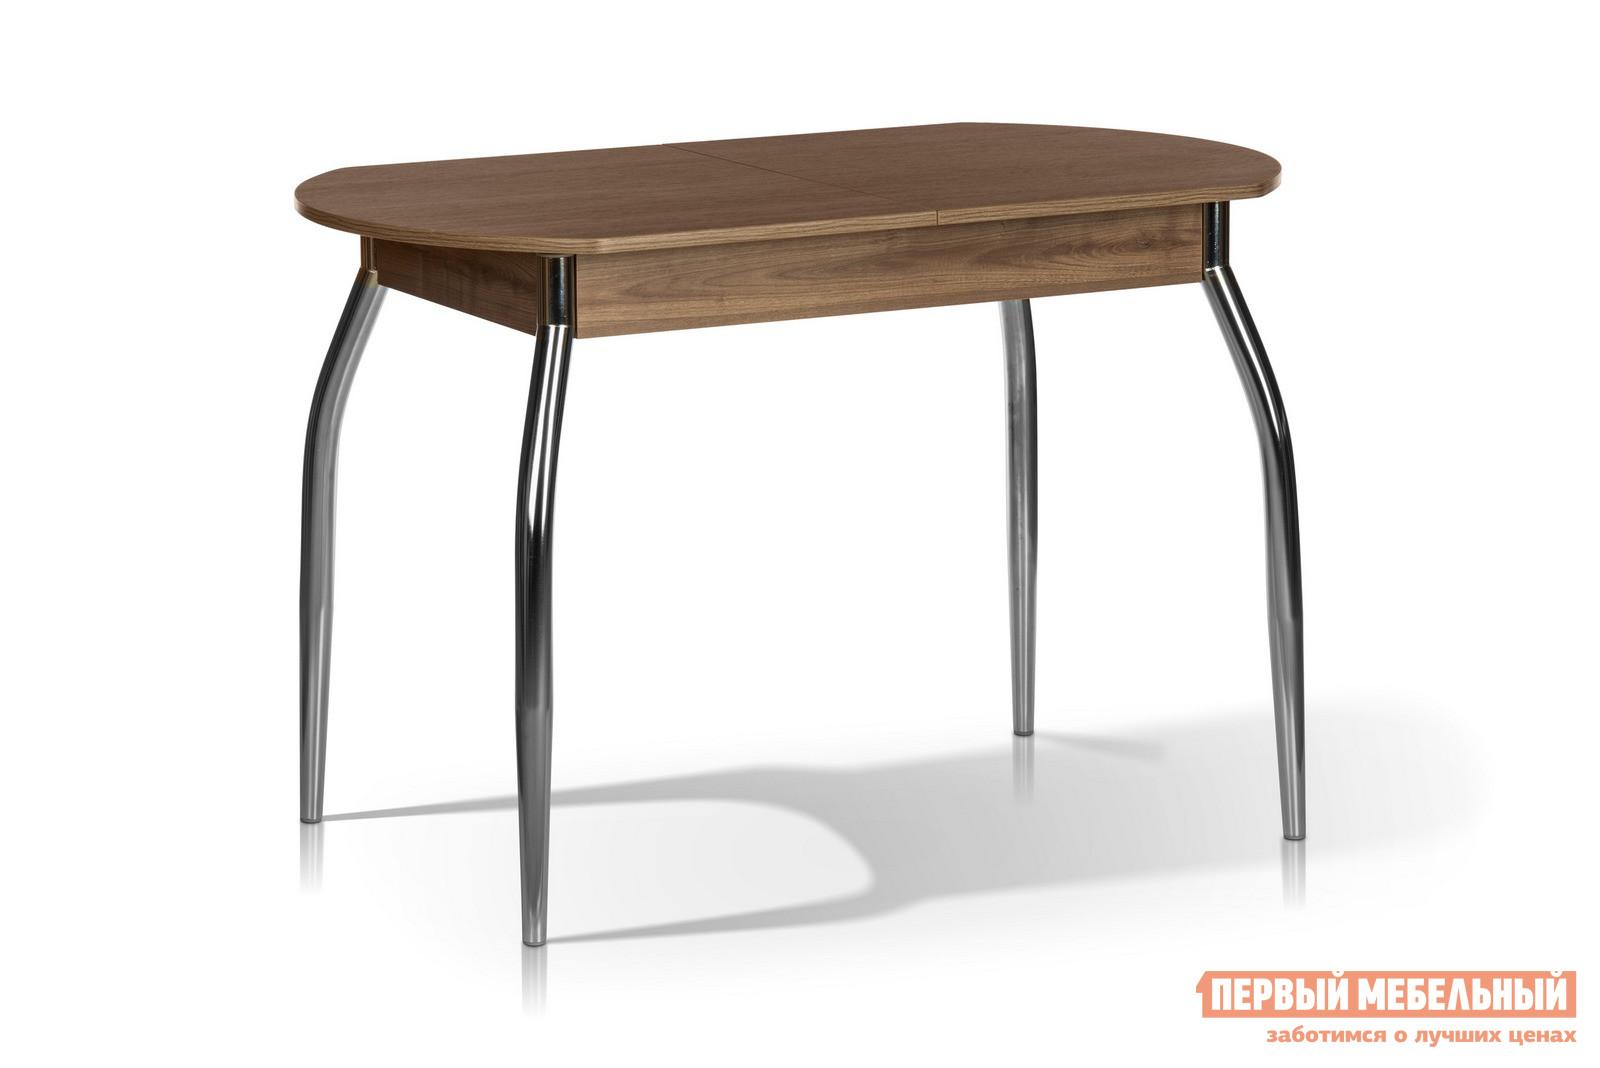 Кухонный стол МегаЭлатон Сиена Мини Каштан минск